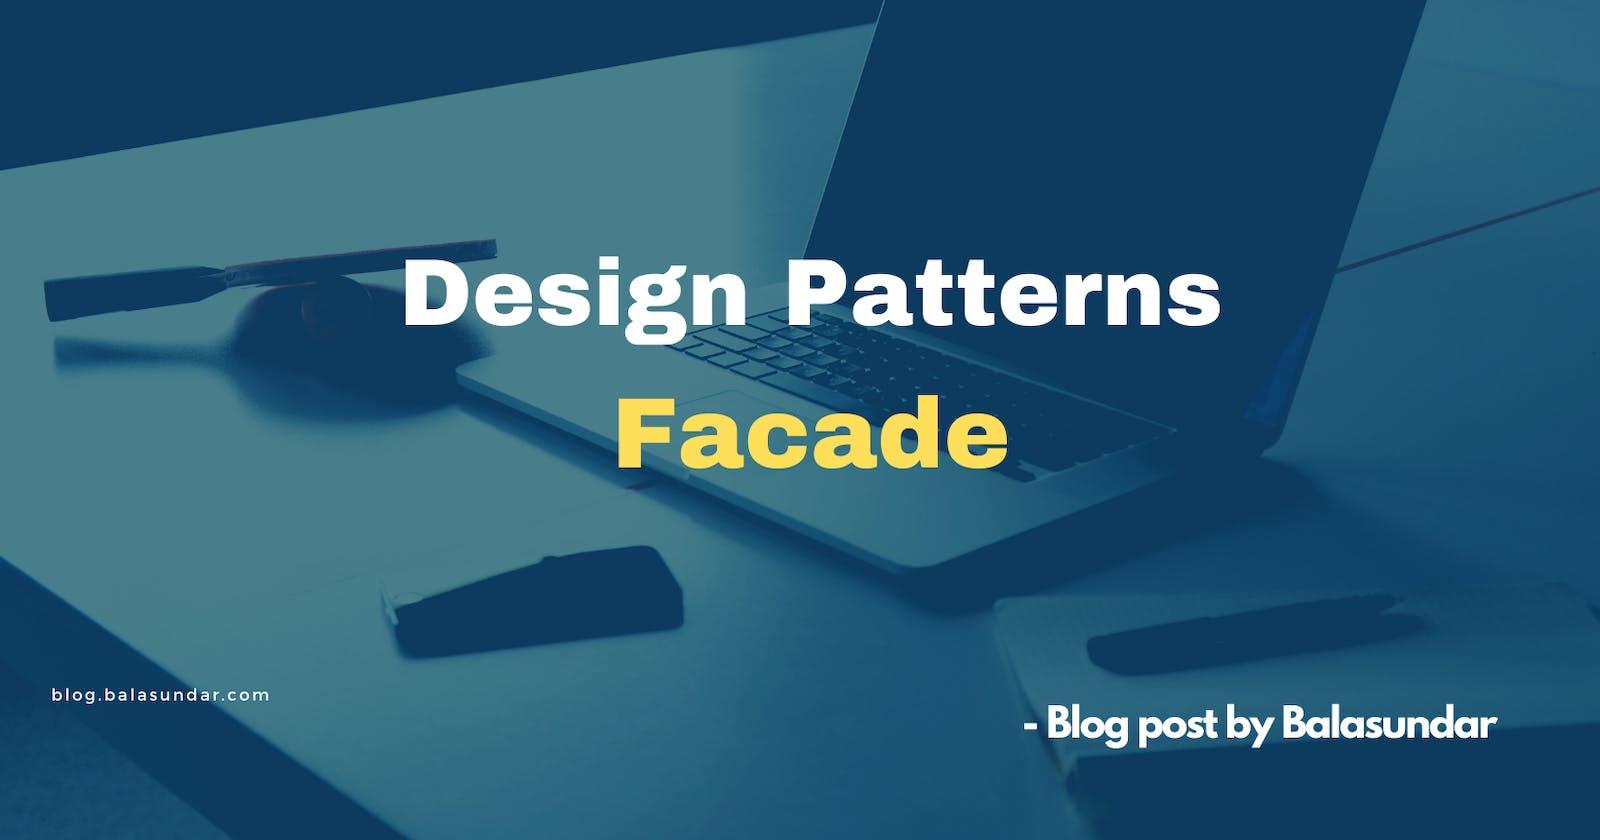 Design Patterns - Facade